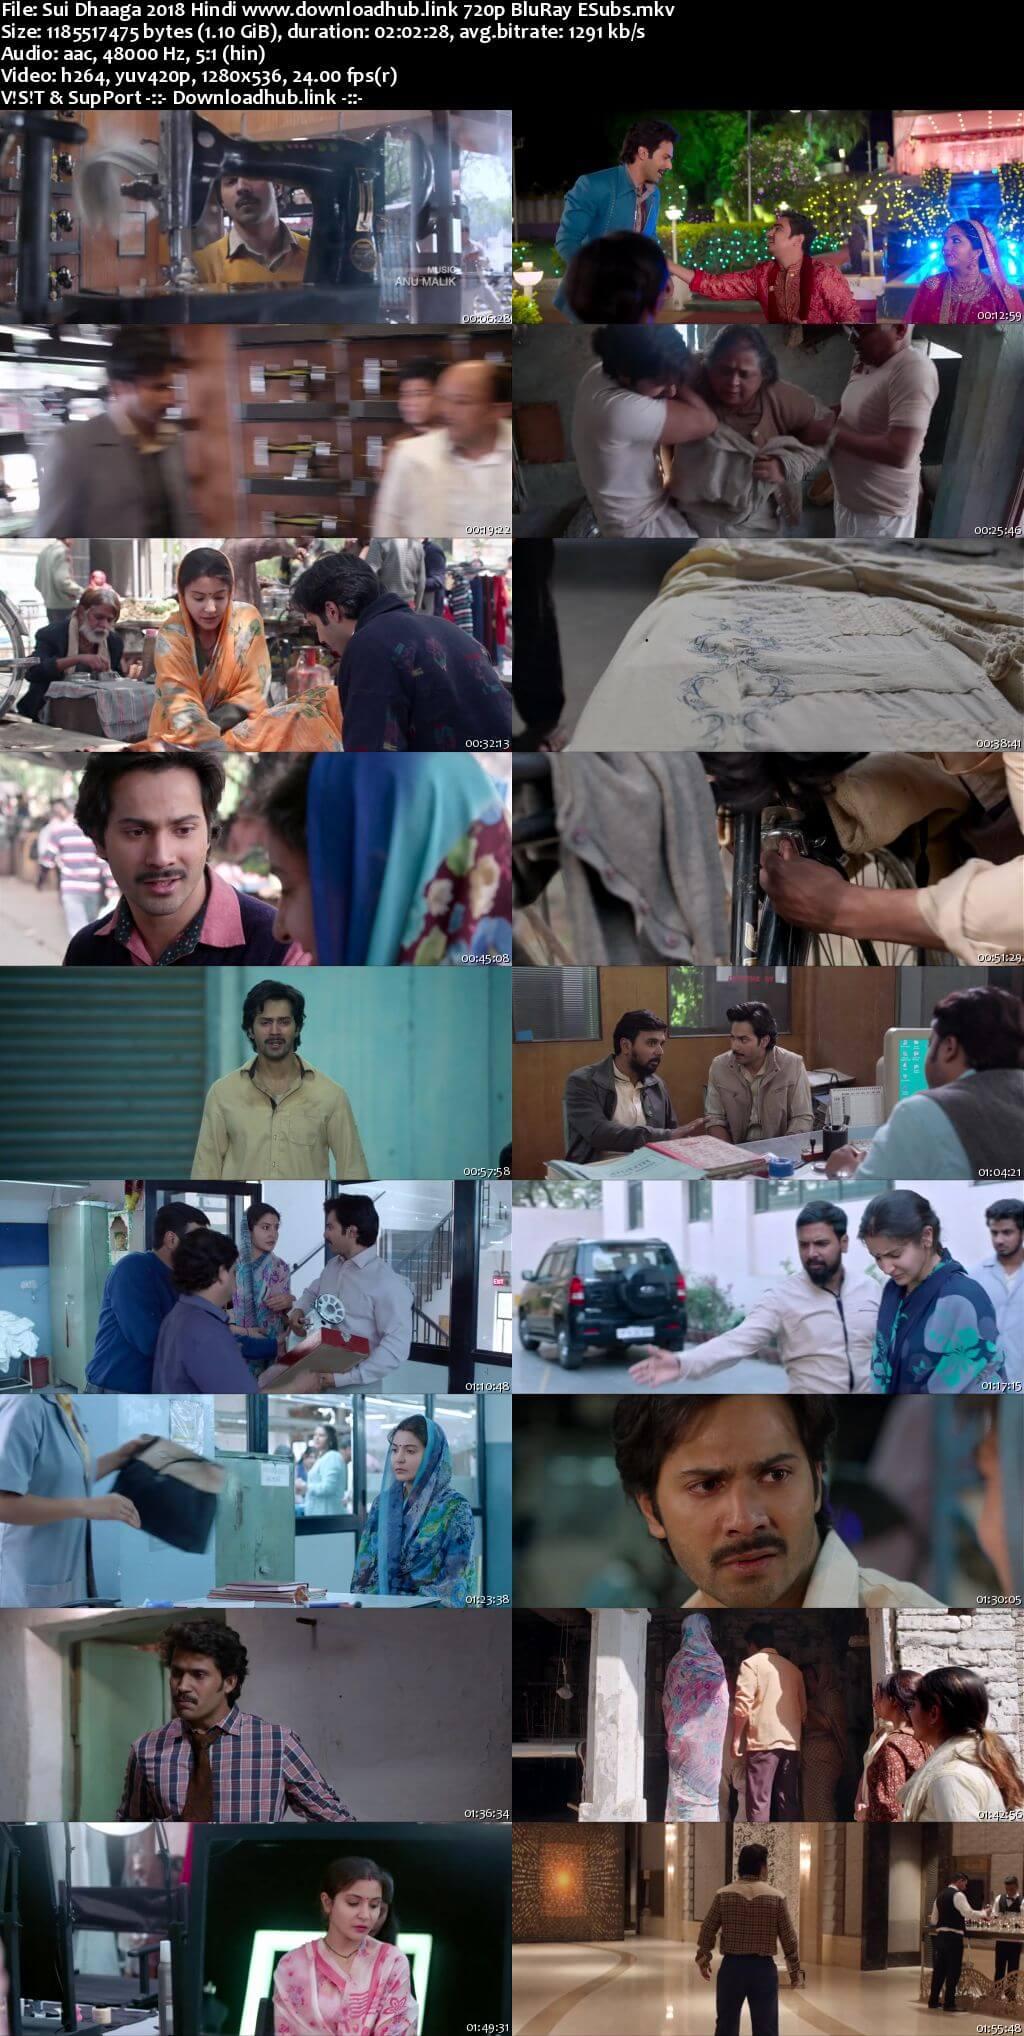 Sui Dhaaga 2018 Hindi 720p BluRay ESubs